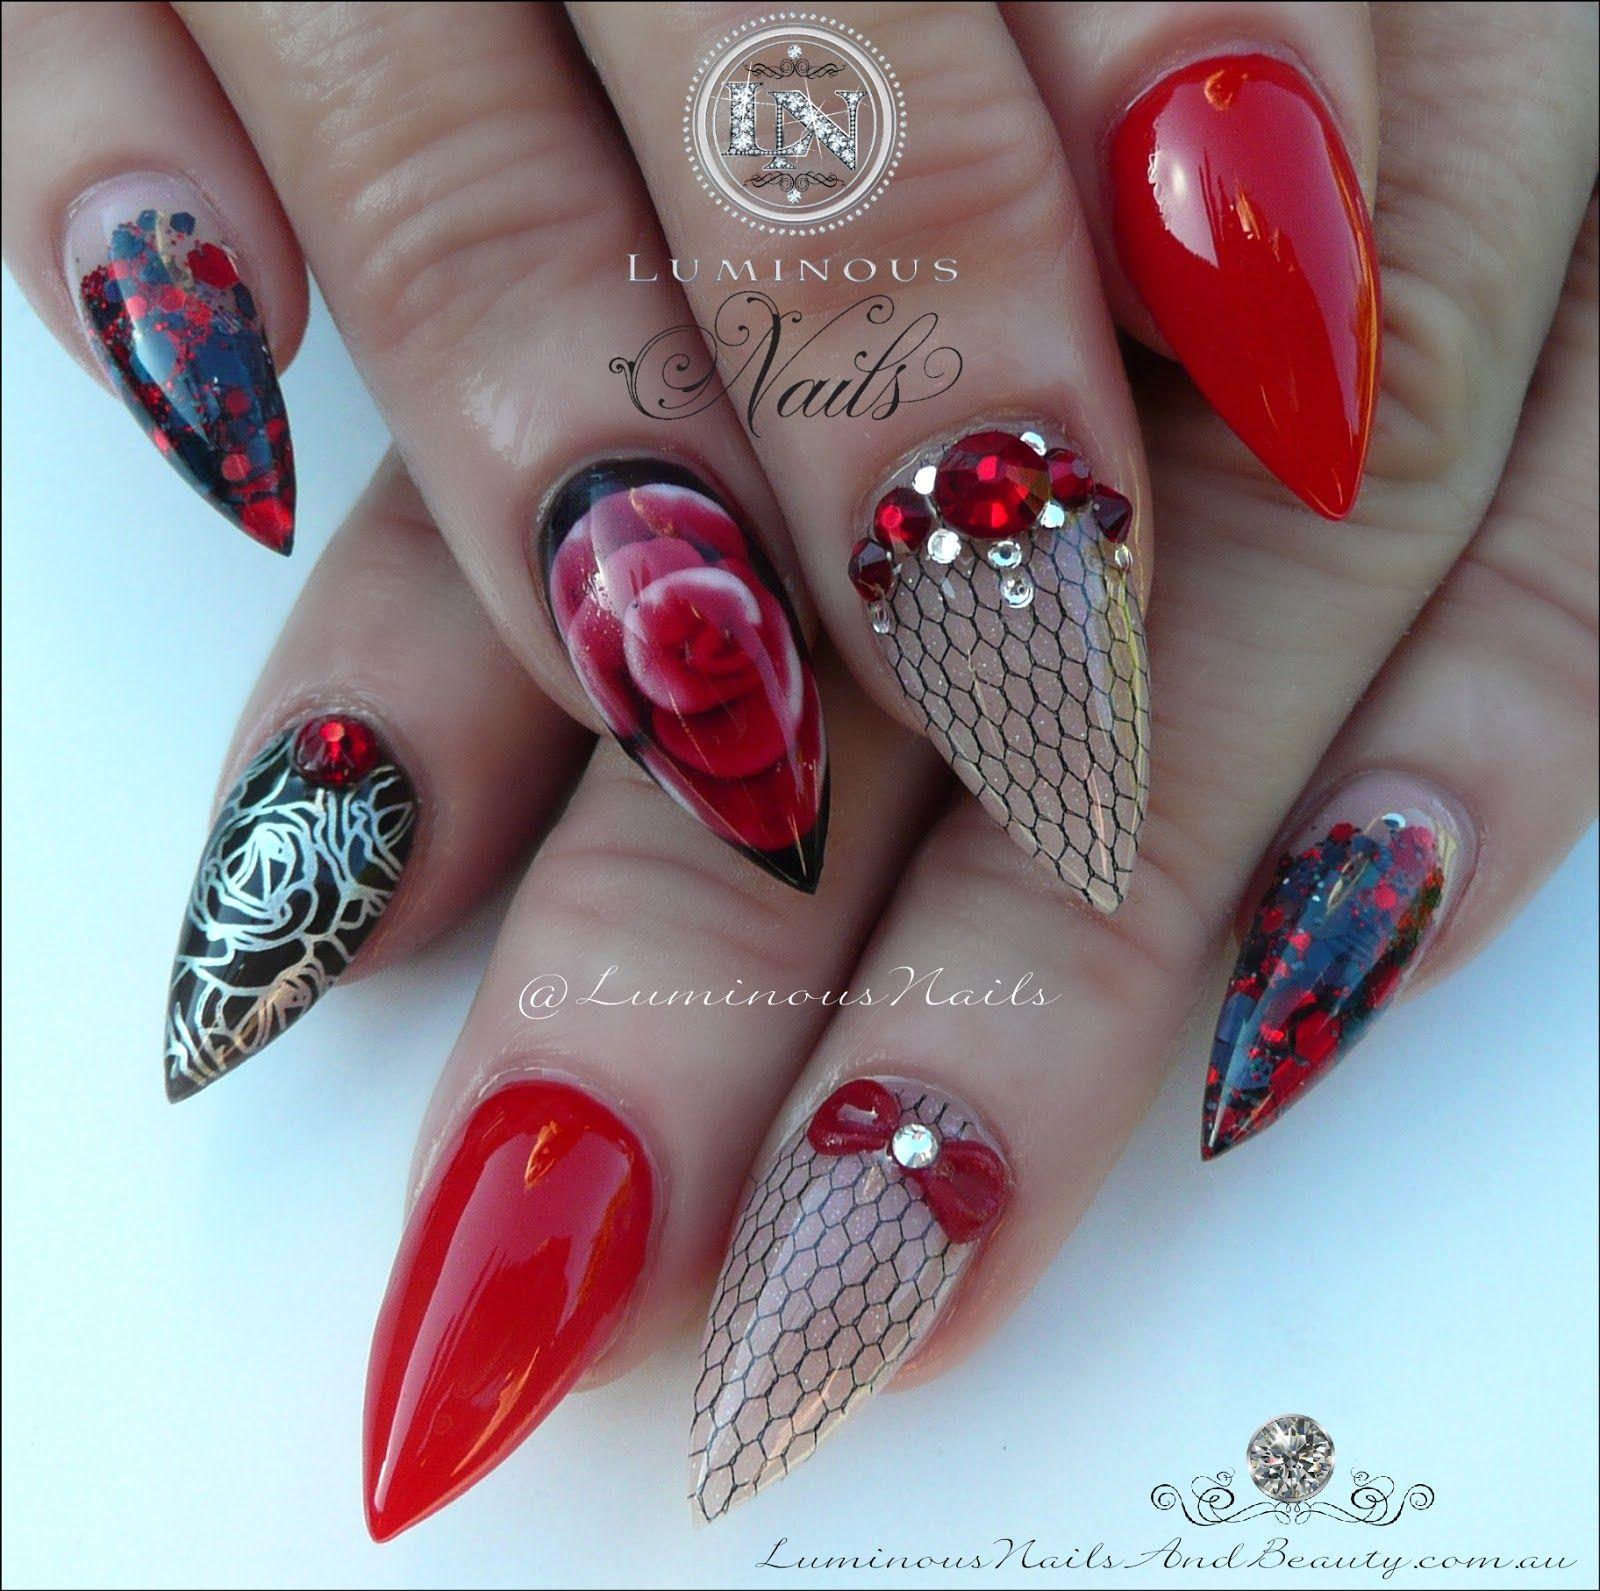 Luminous+Nails+%26+Beauty%2C+Gold+Coast+QLD.+Red+%26+Black+Nails.+ ...